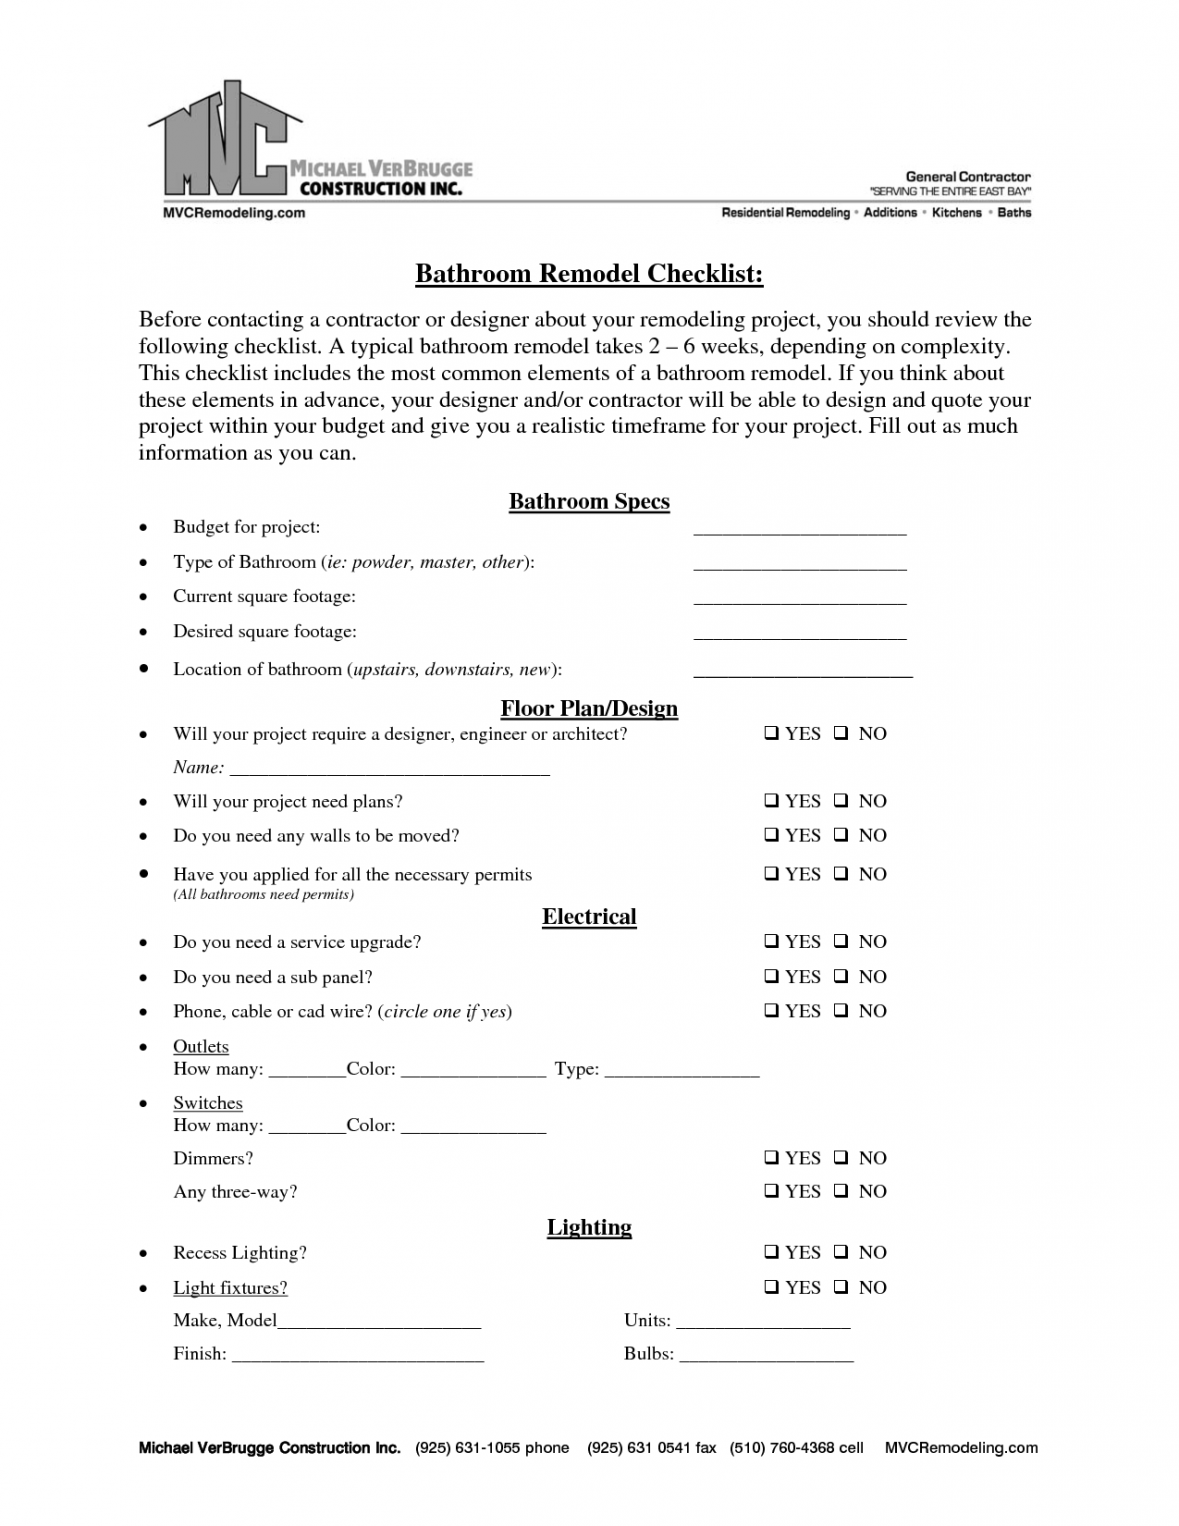 Bathroom Bathroom Remodel Engaging Kitchen Remodel Checklist Template Remodeling Checklist Templ Kitchen Remodel Checklist Remodeling Checklist Kitchen Remodel